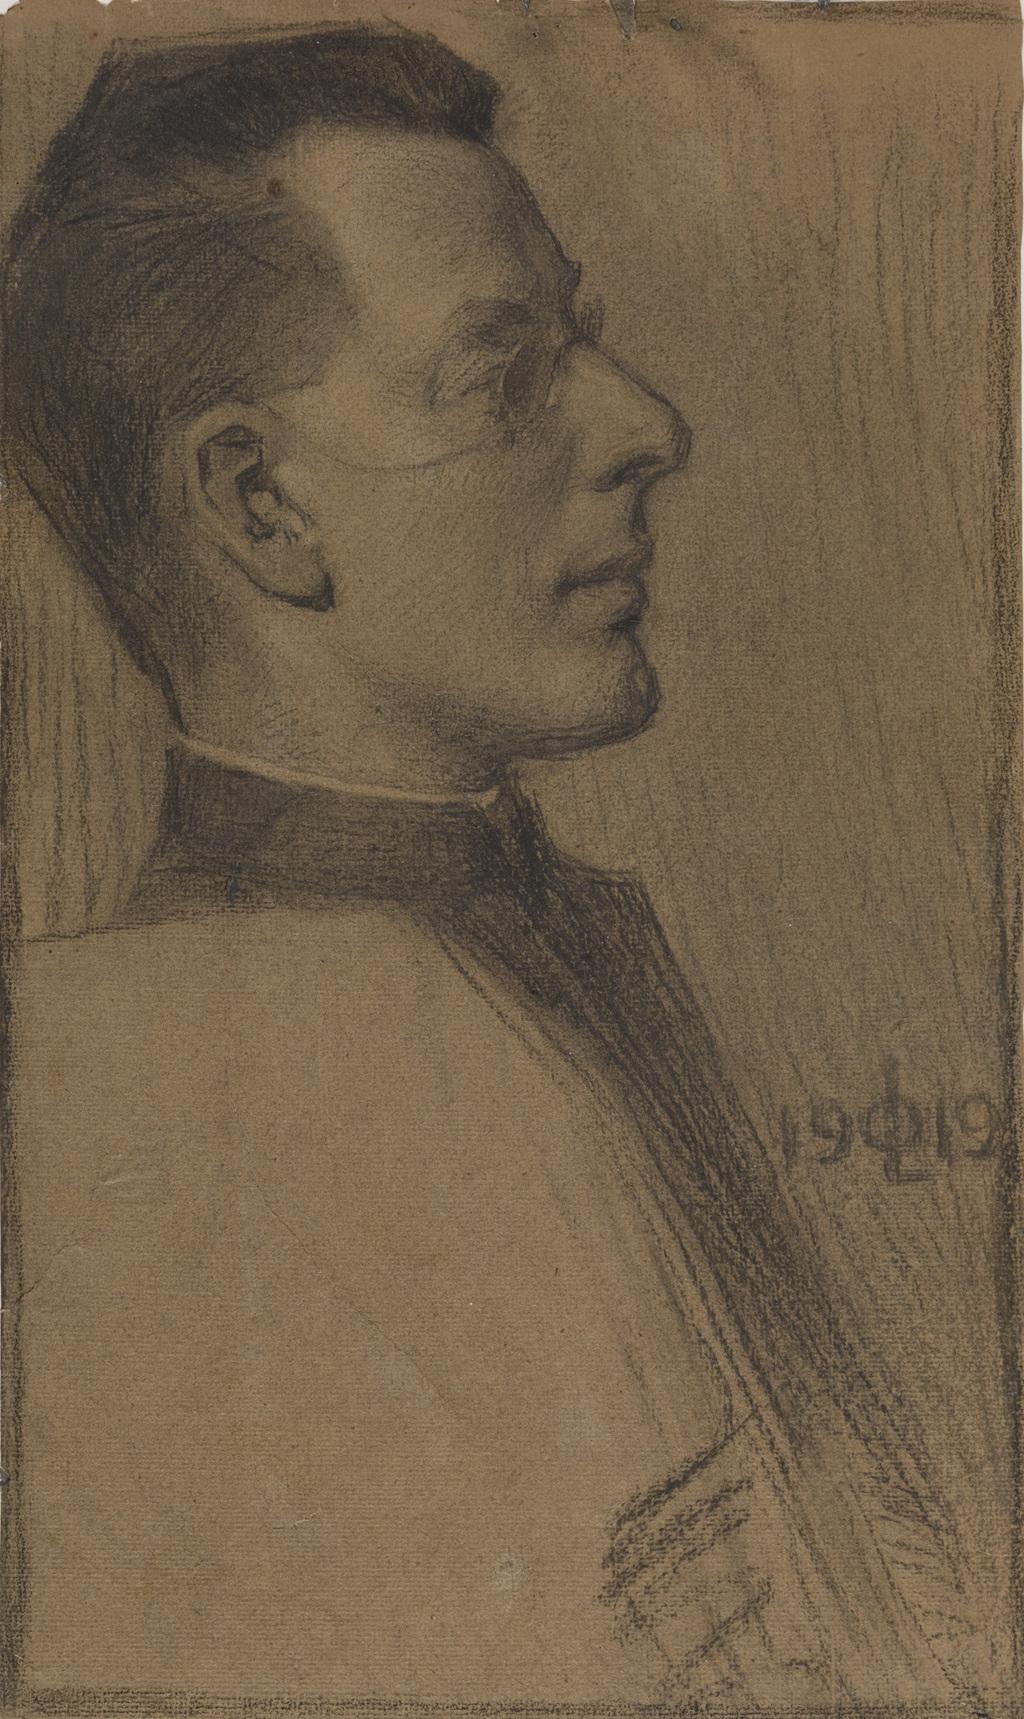 Olivier Maurault, p.s.s.